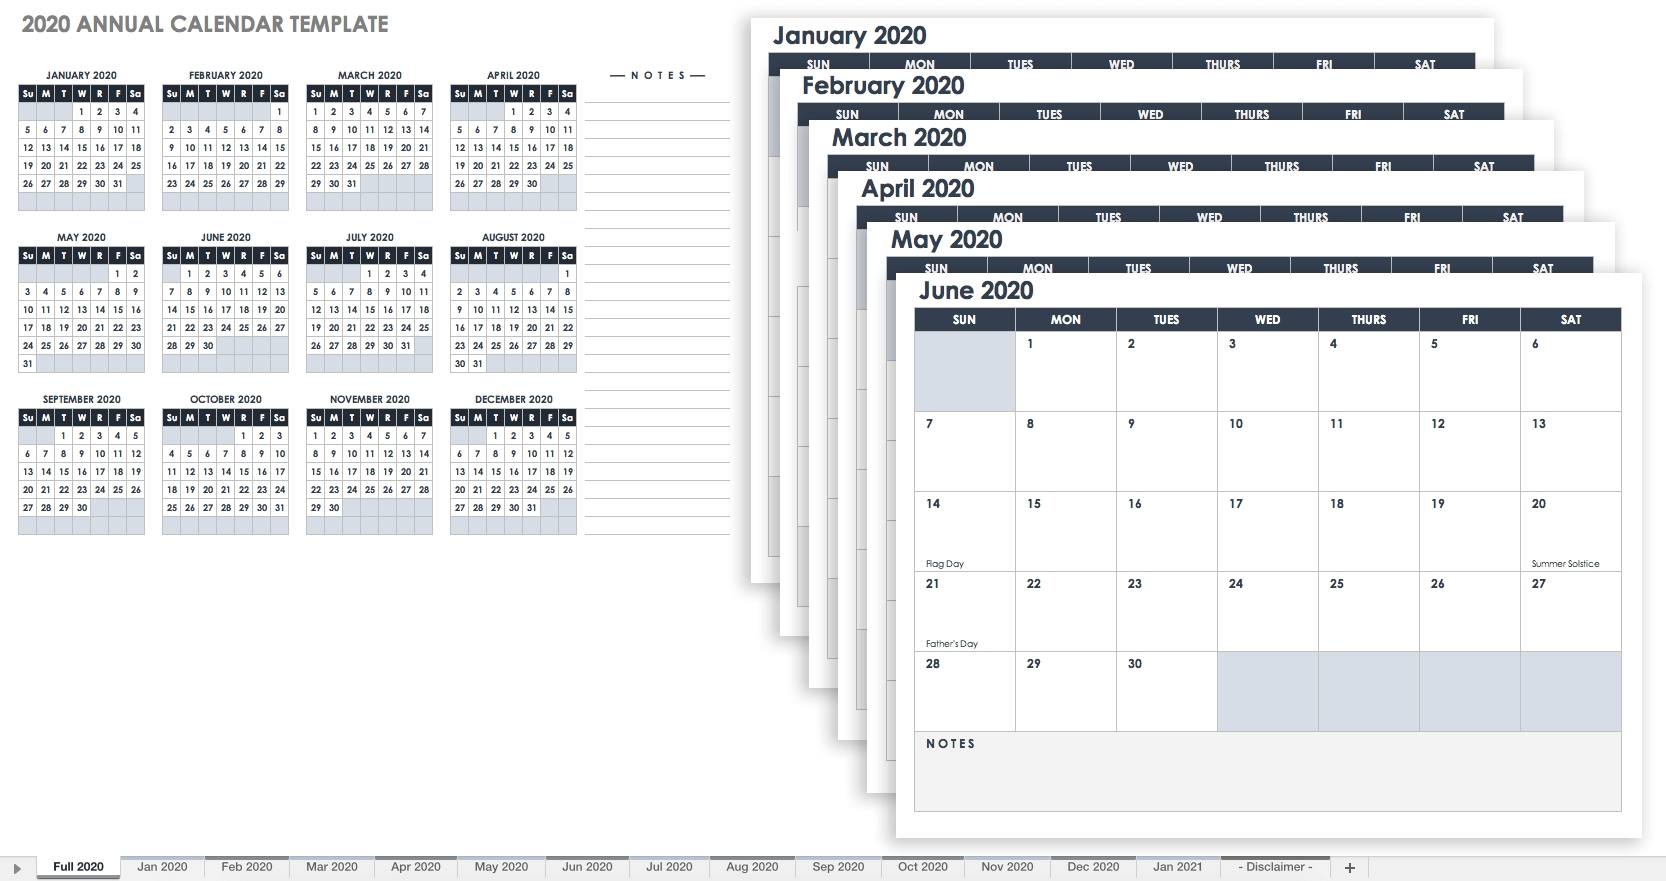 Free, Printable Excel Calendar Templates For 2019 & On | Smartsheet regarding Excel 2020 Calendar Year Formula